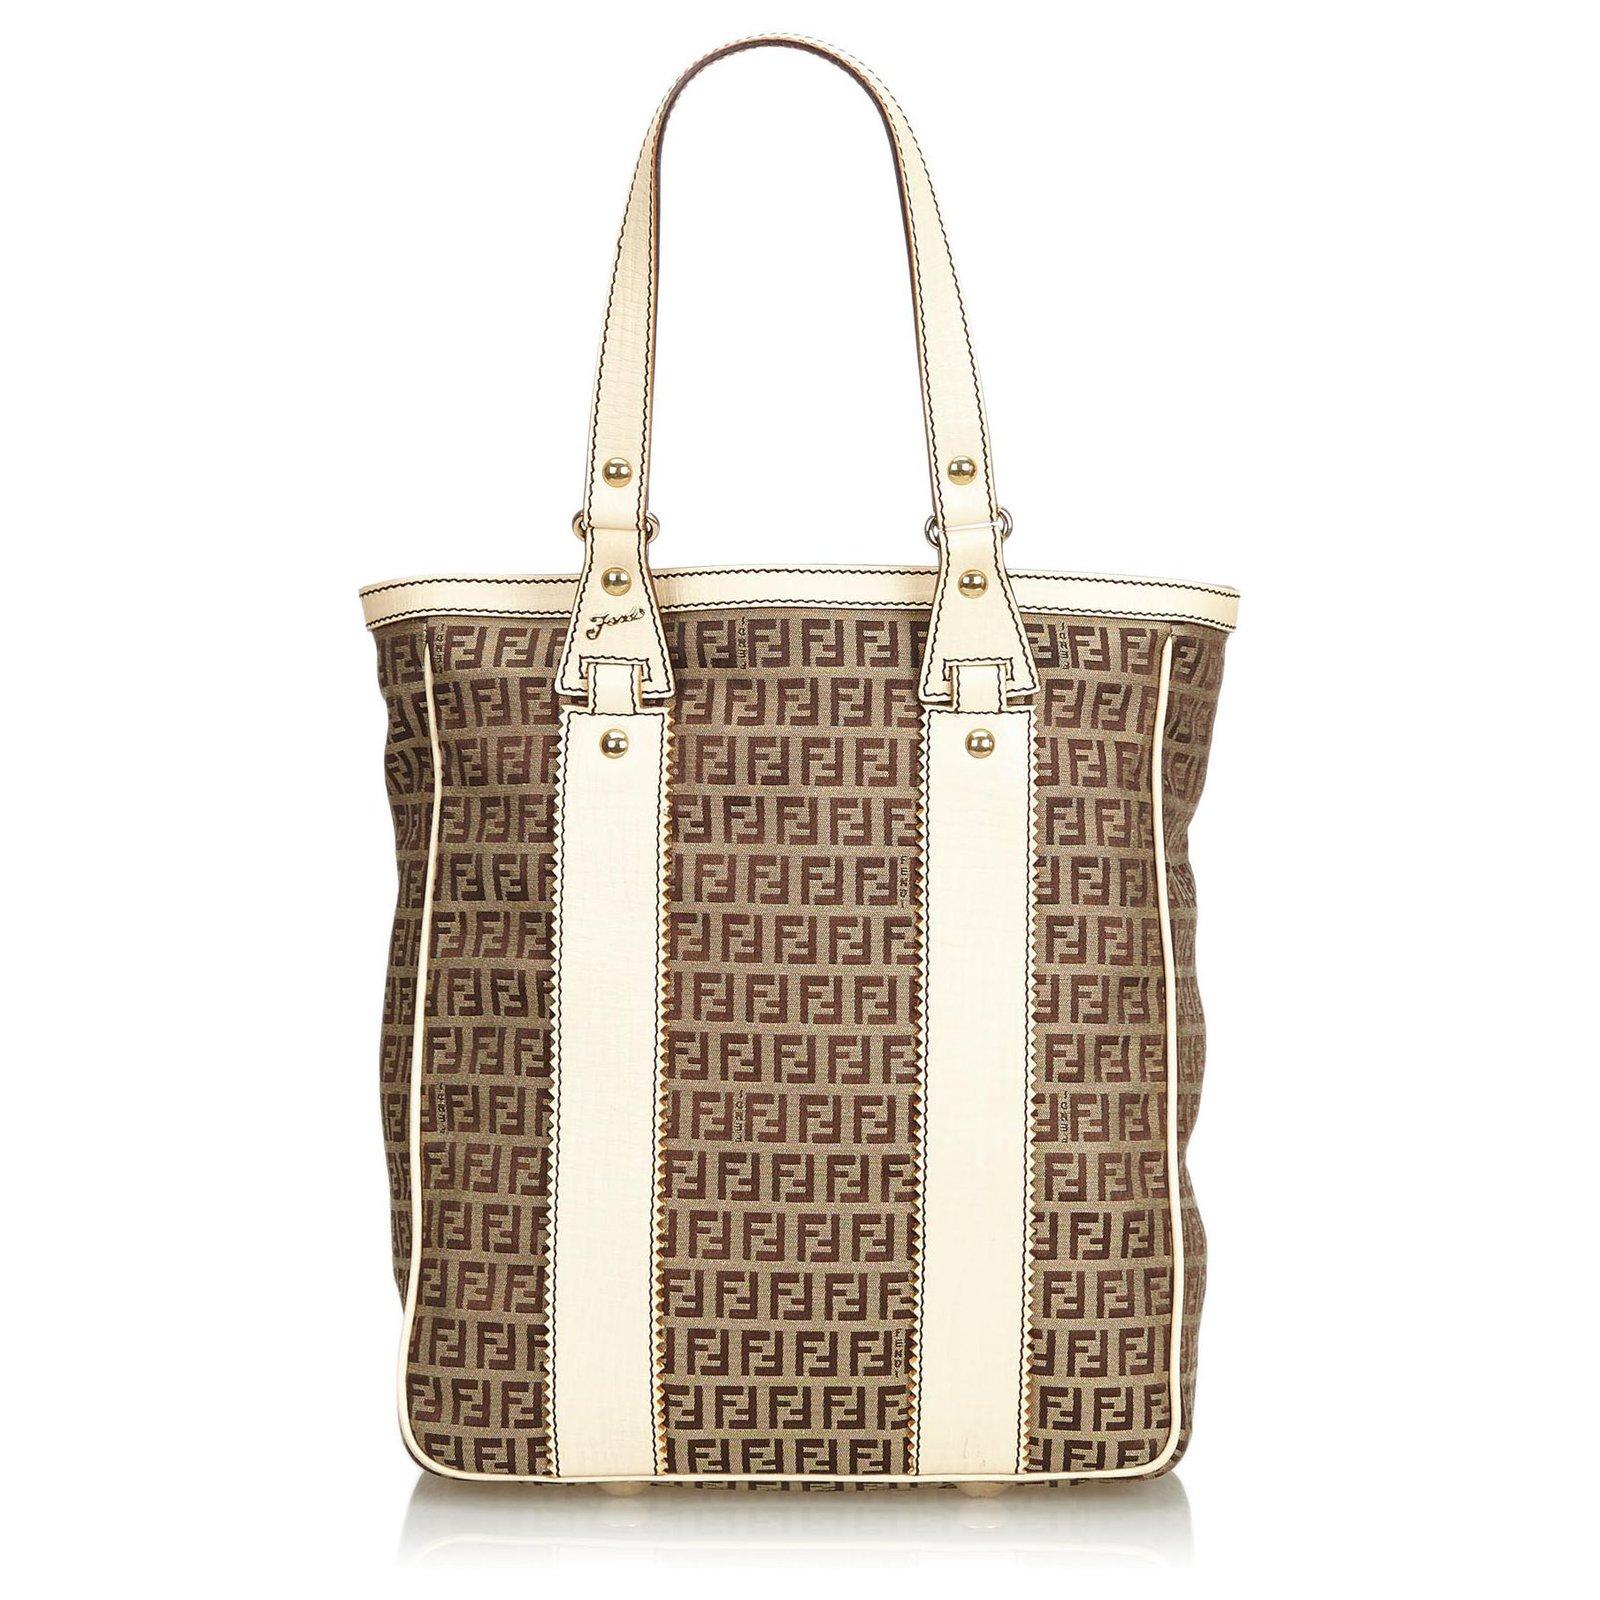 2548c896ff156 Fendi Fendi Brown Zucchino Jacquard Tote Bag Totes Leather